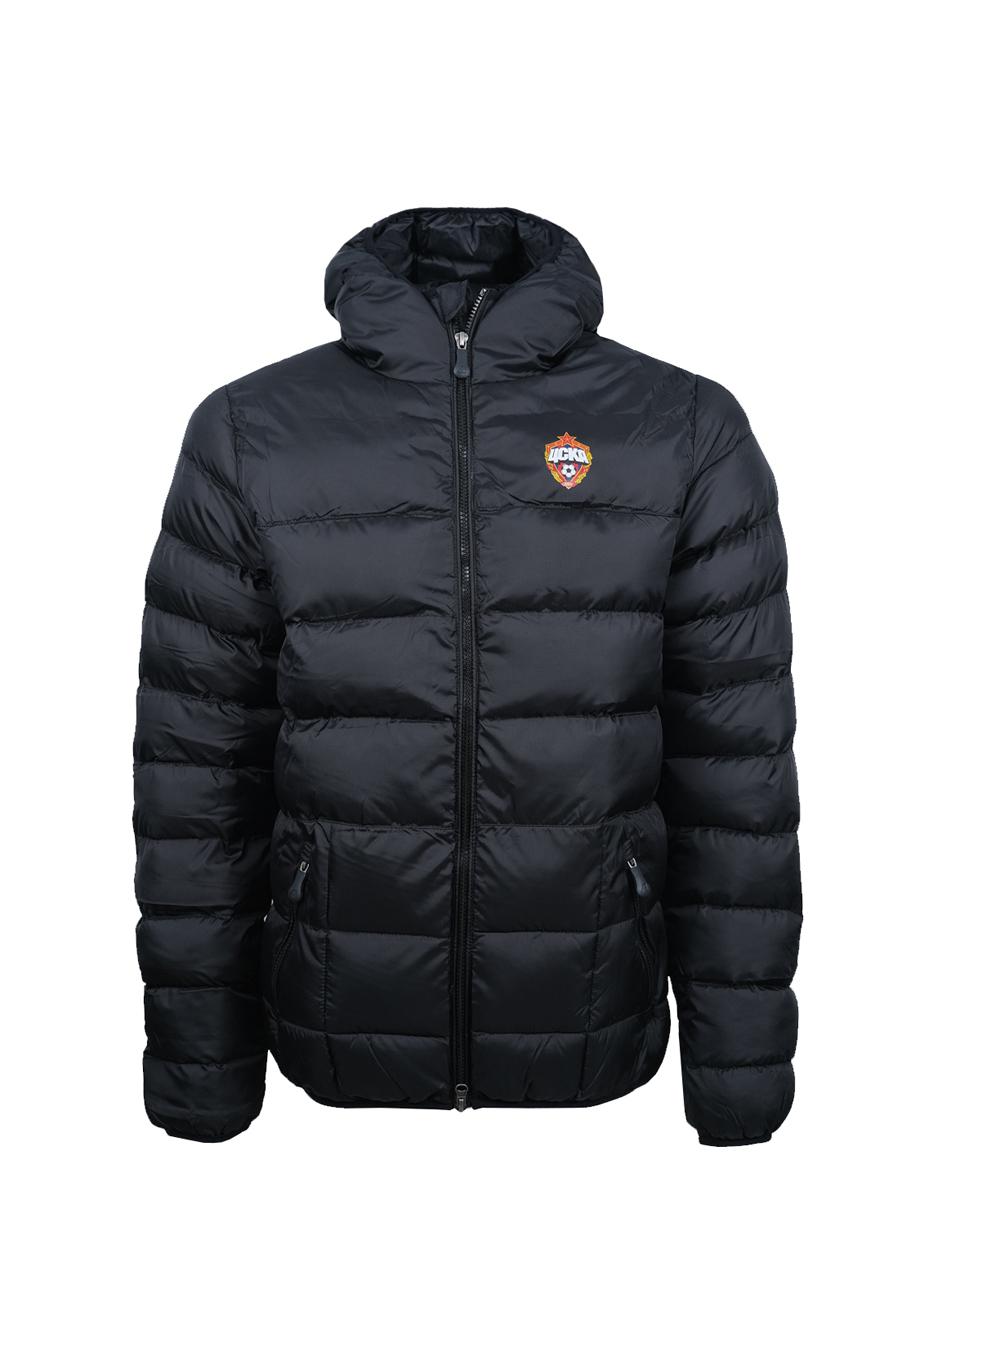 Куртка утеплённая, цвет чёрный (M) фото